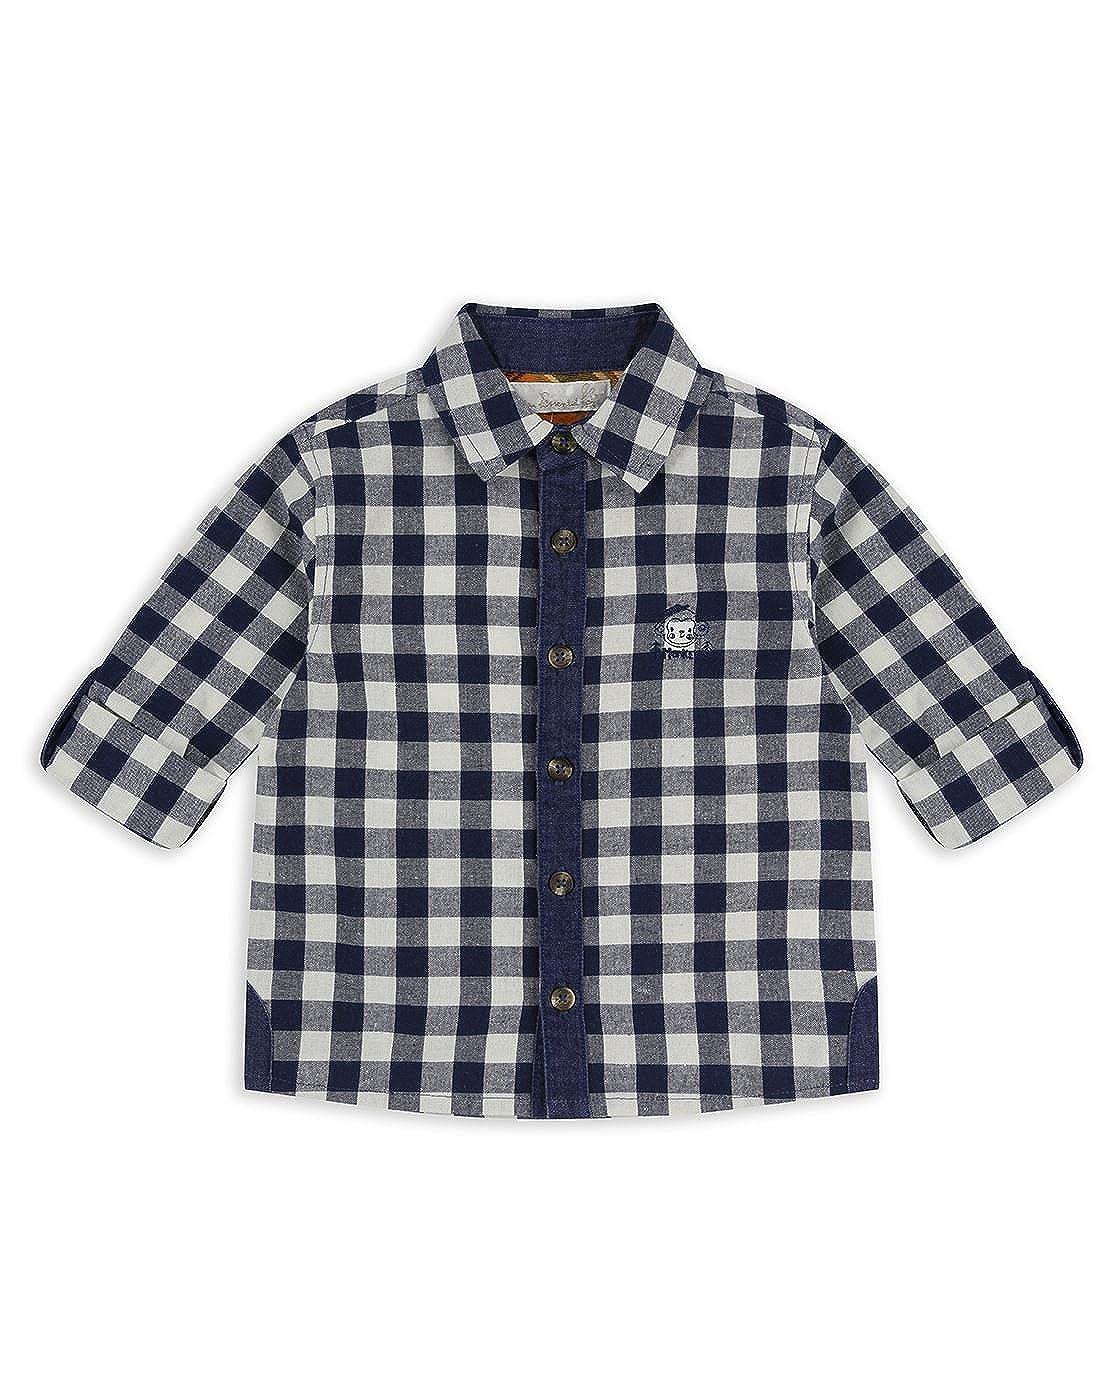 The Essential One Baby Kids Boys Long-Sleeve Monkey Shirt - Navy Blue - EOT456